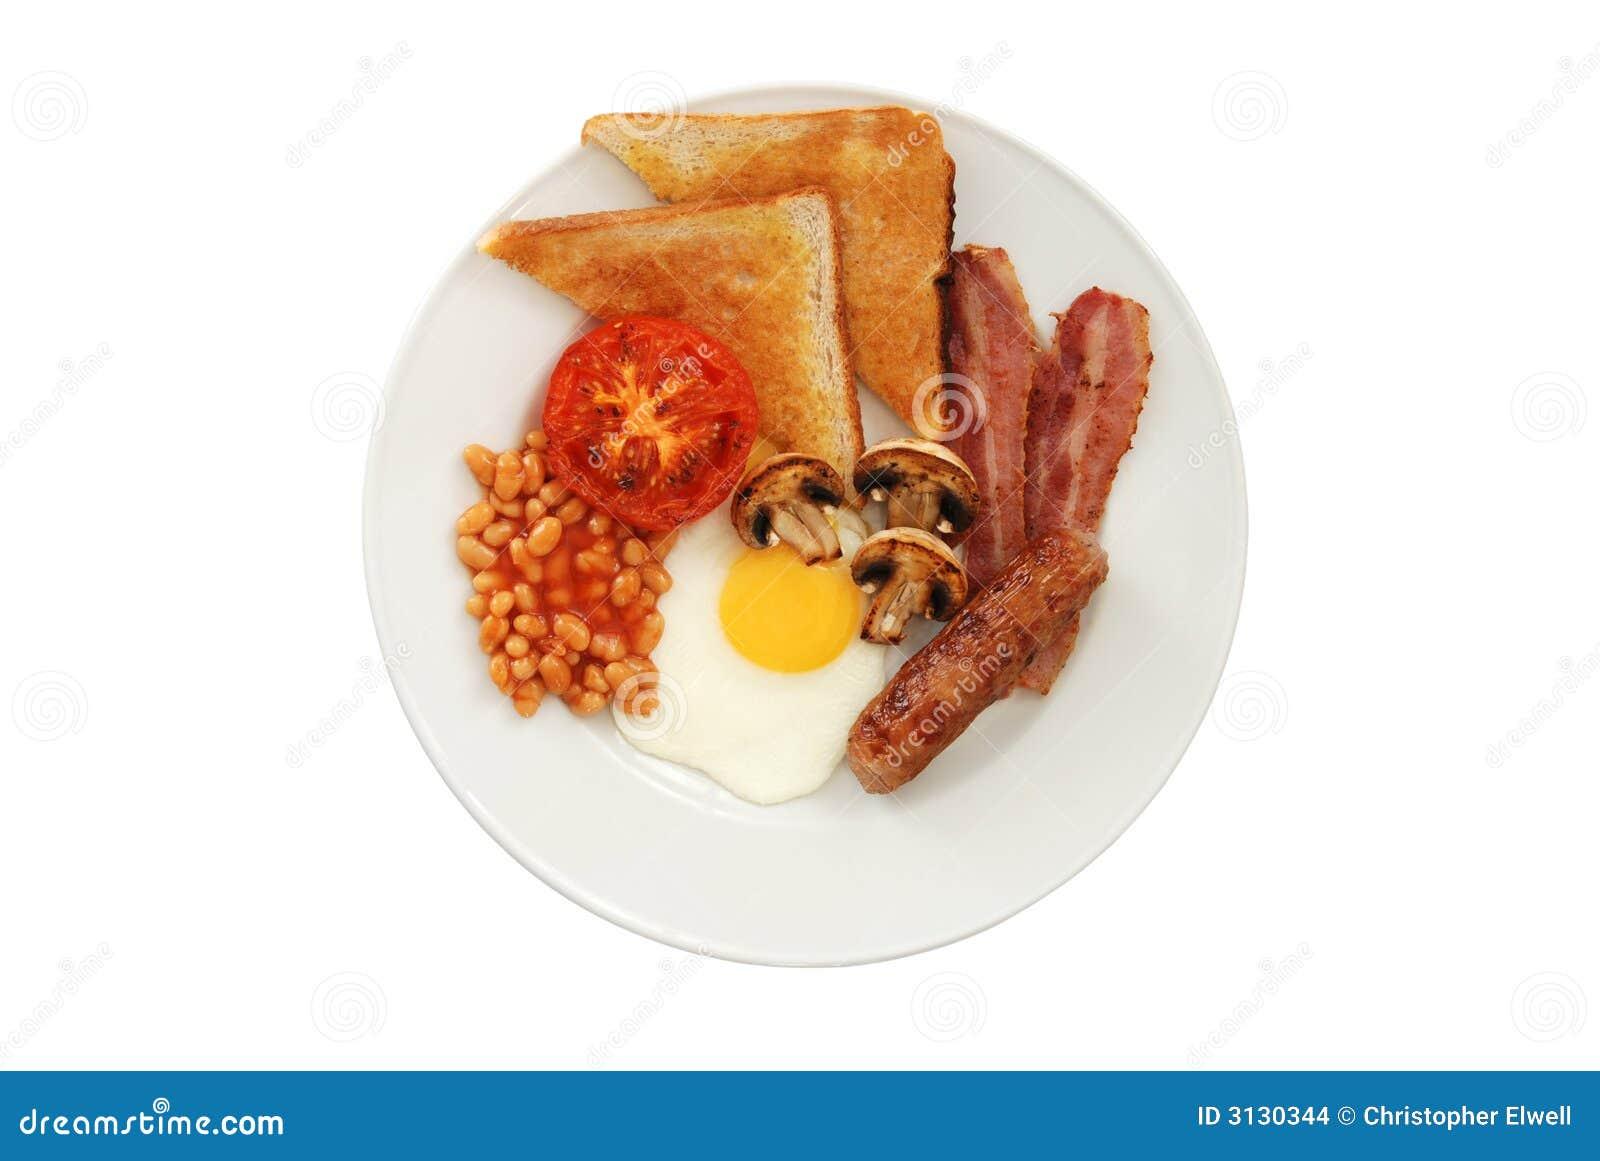 full english breakfast stock images image 3130344